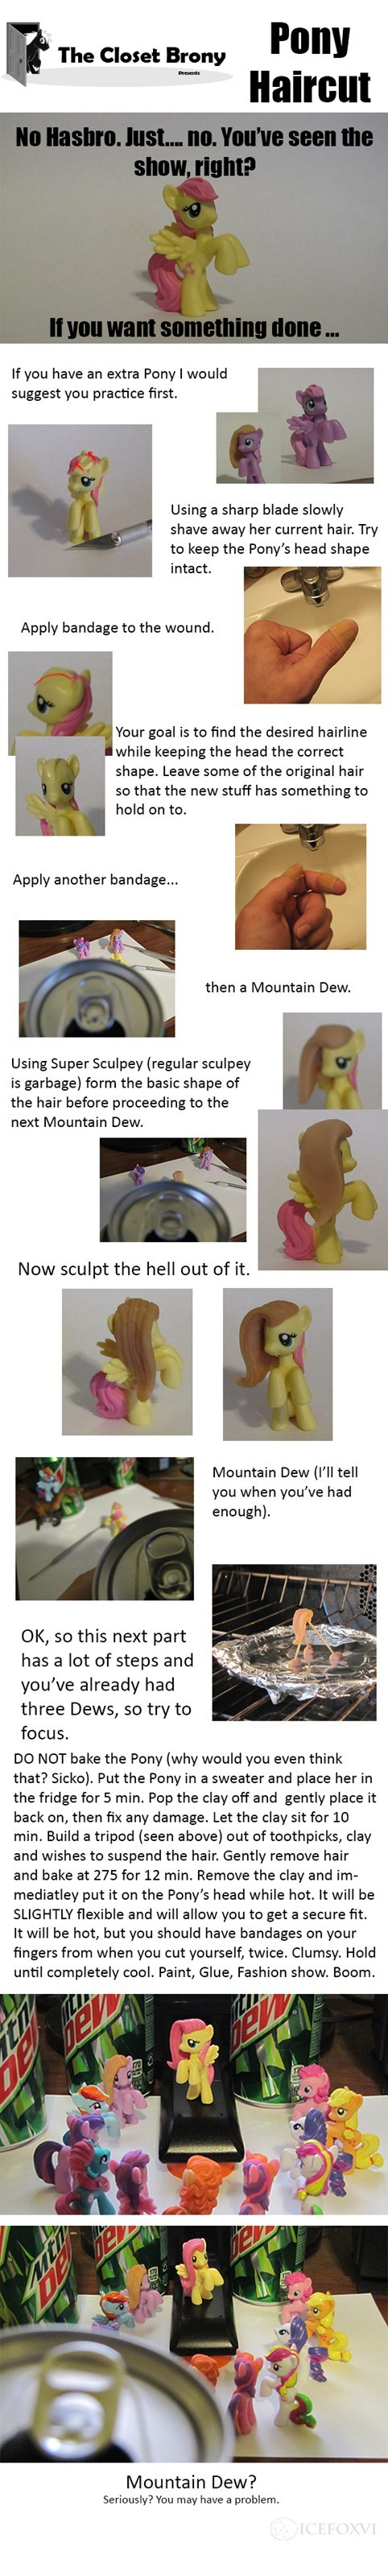 pony haircut Hasbro tldr - 7731323904